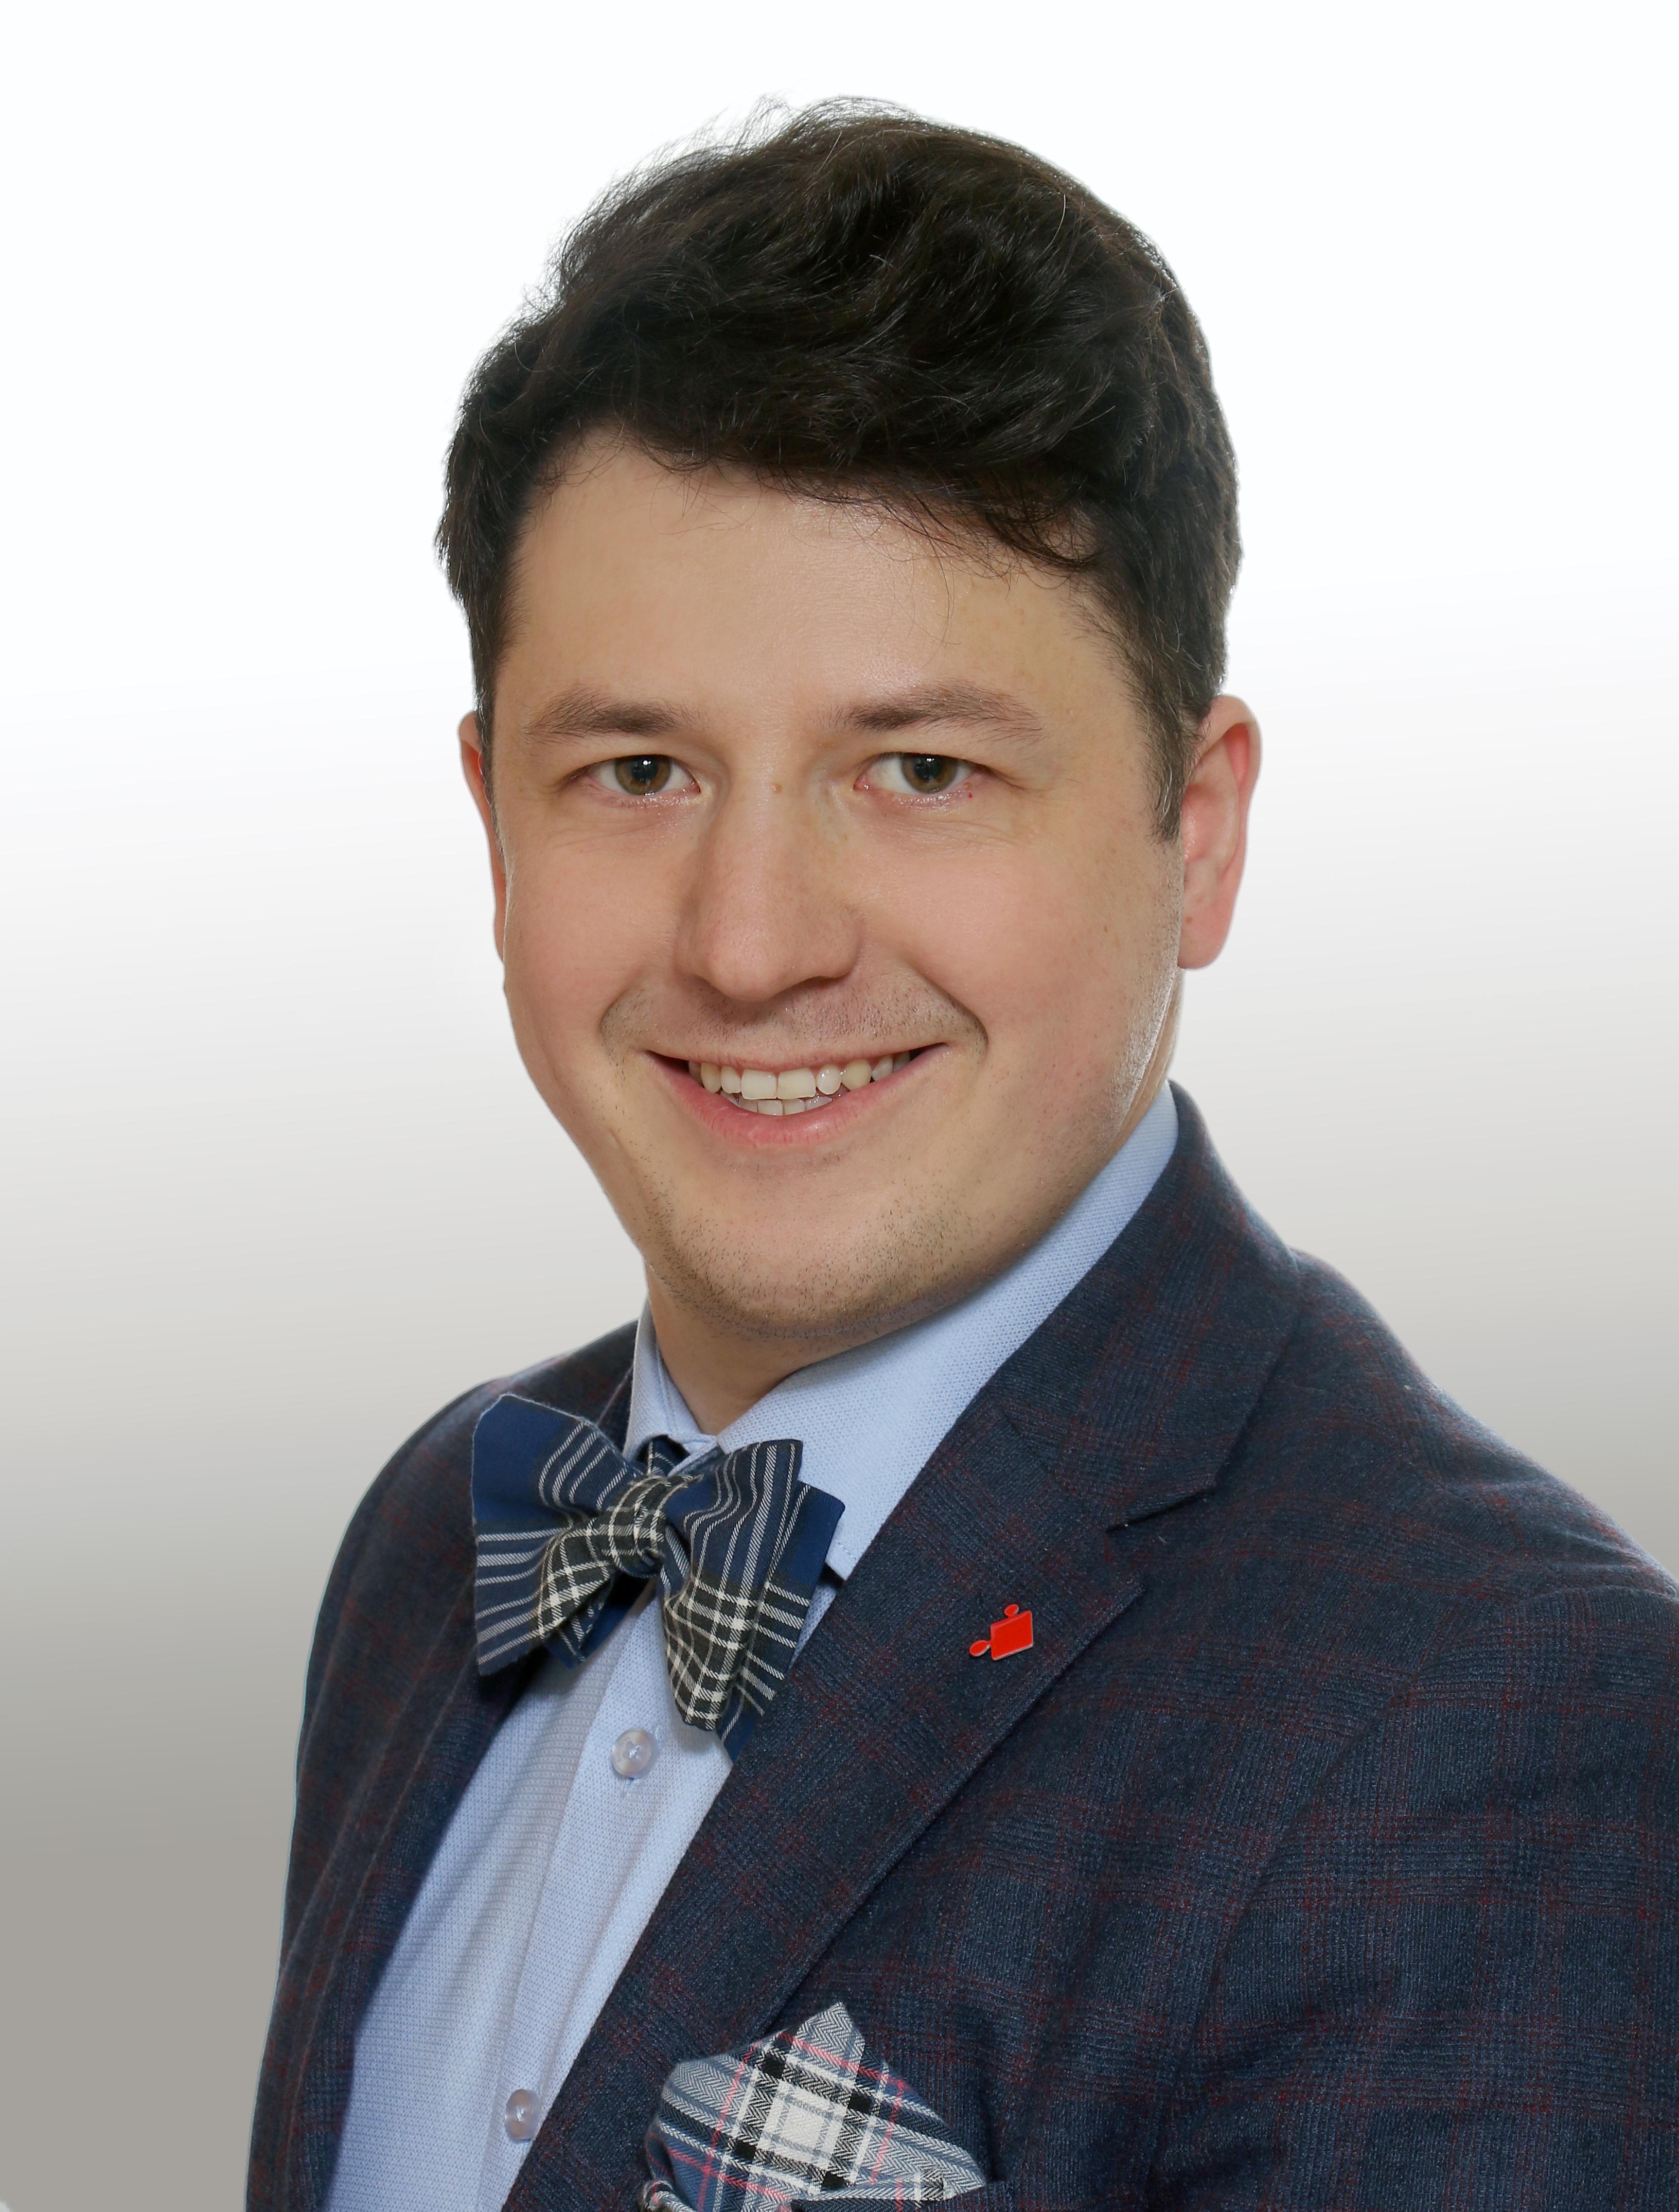 Siejda Michał